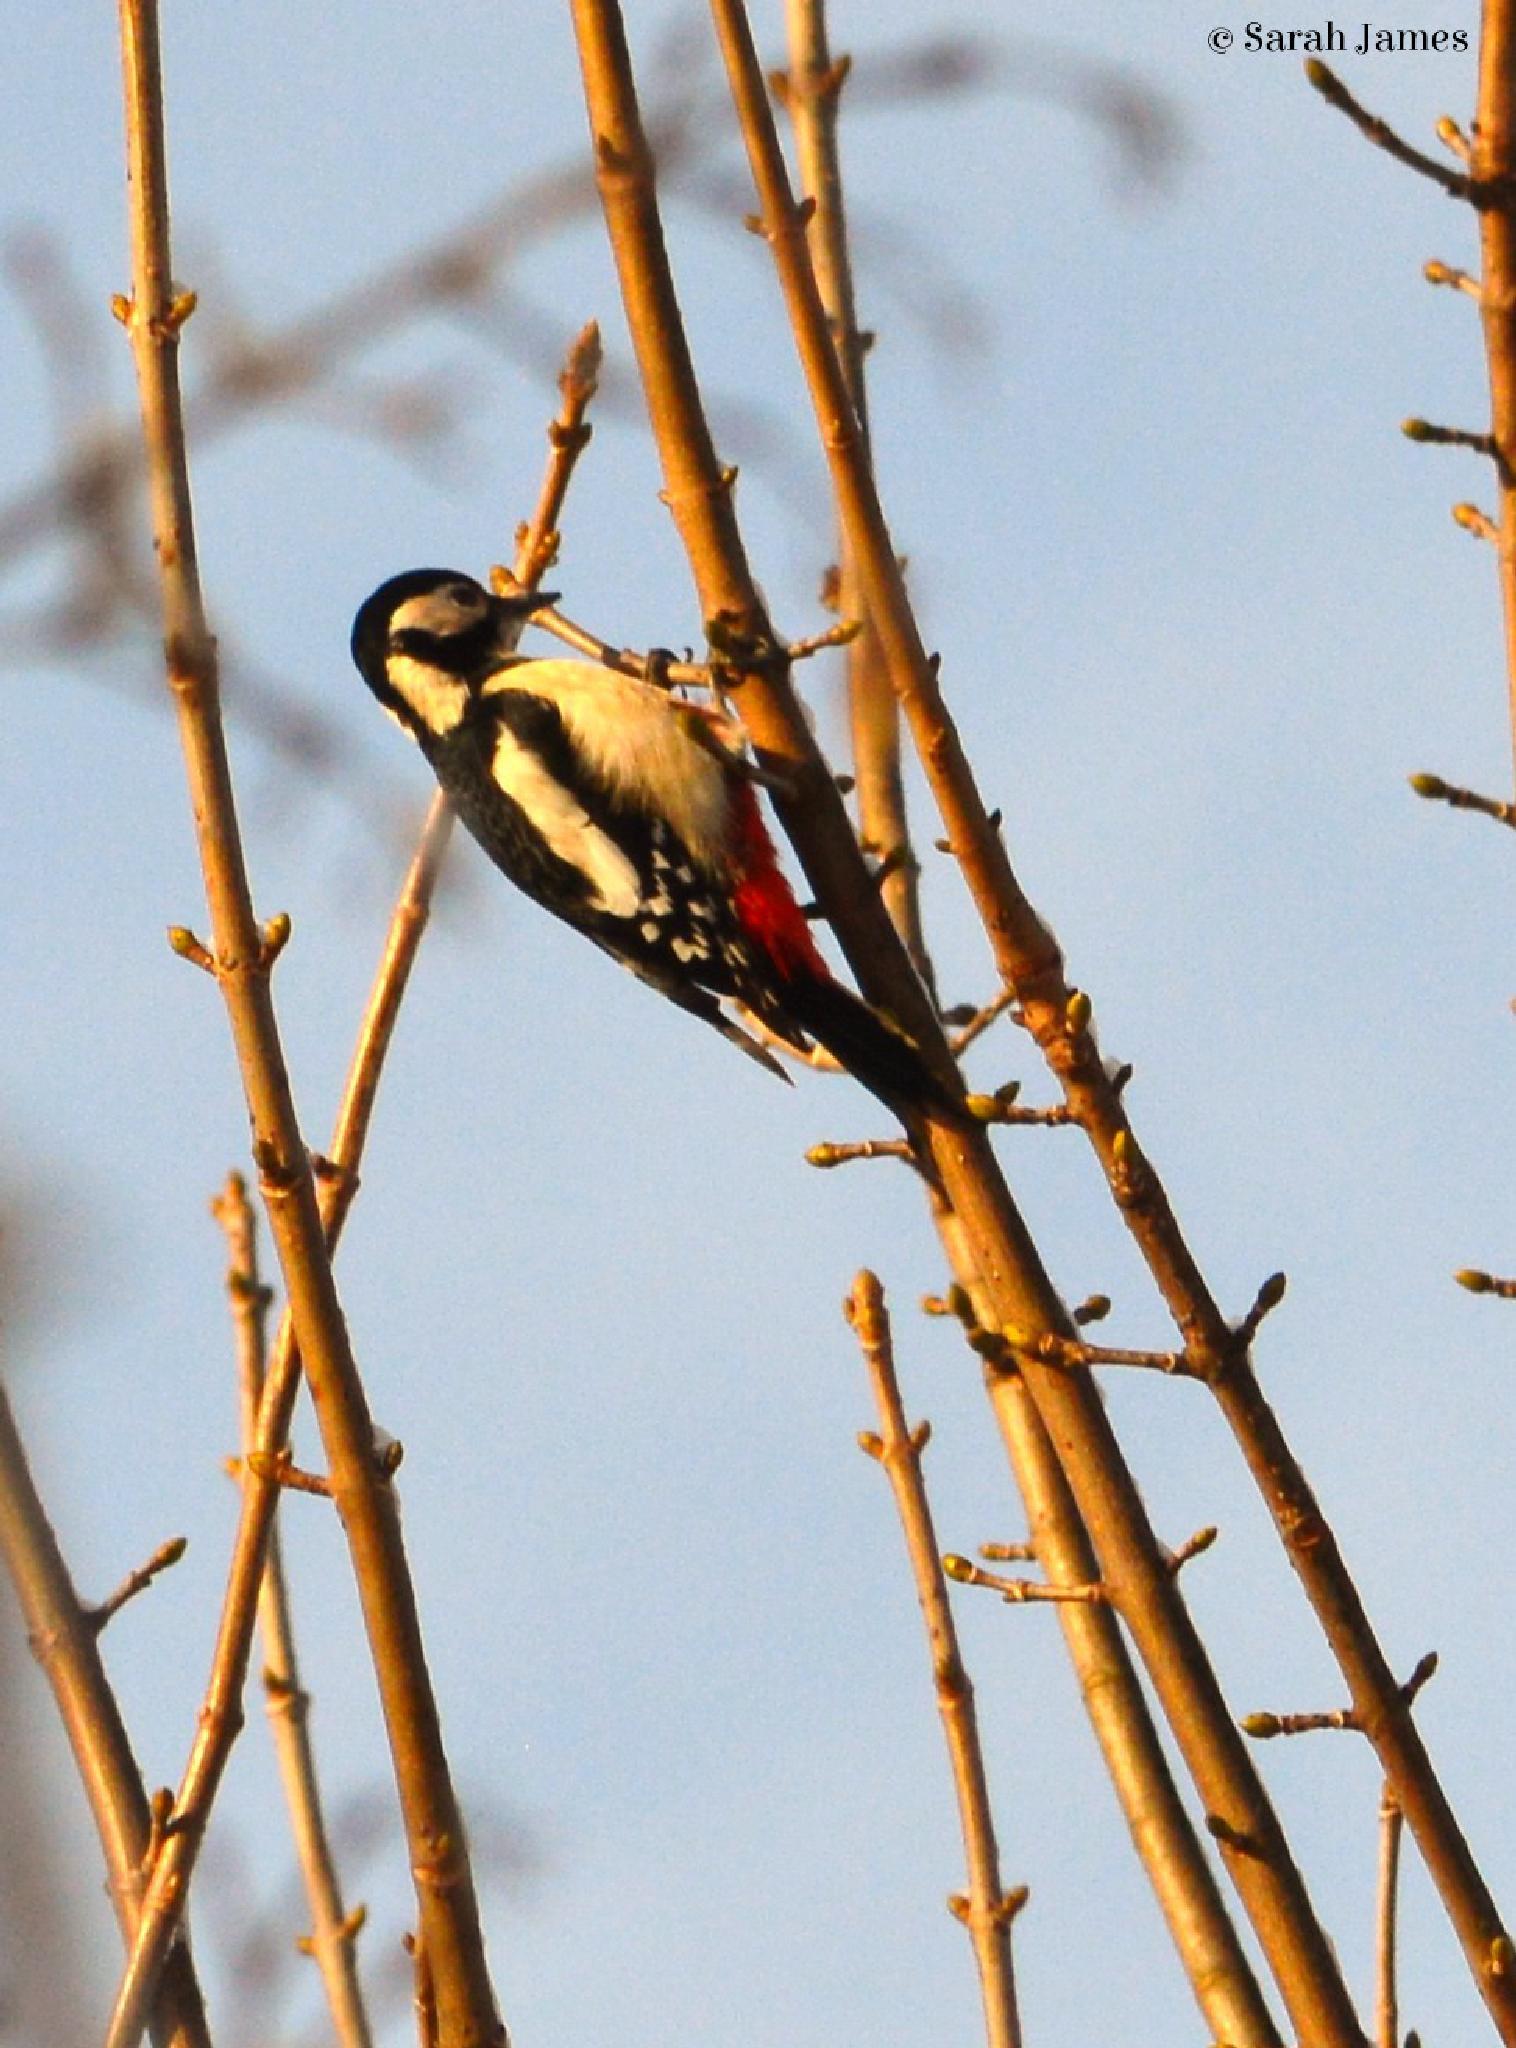 Woodpecker 2 by Sarah James